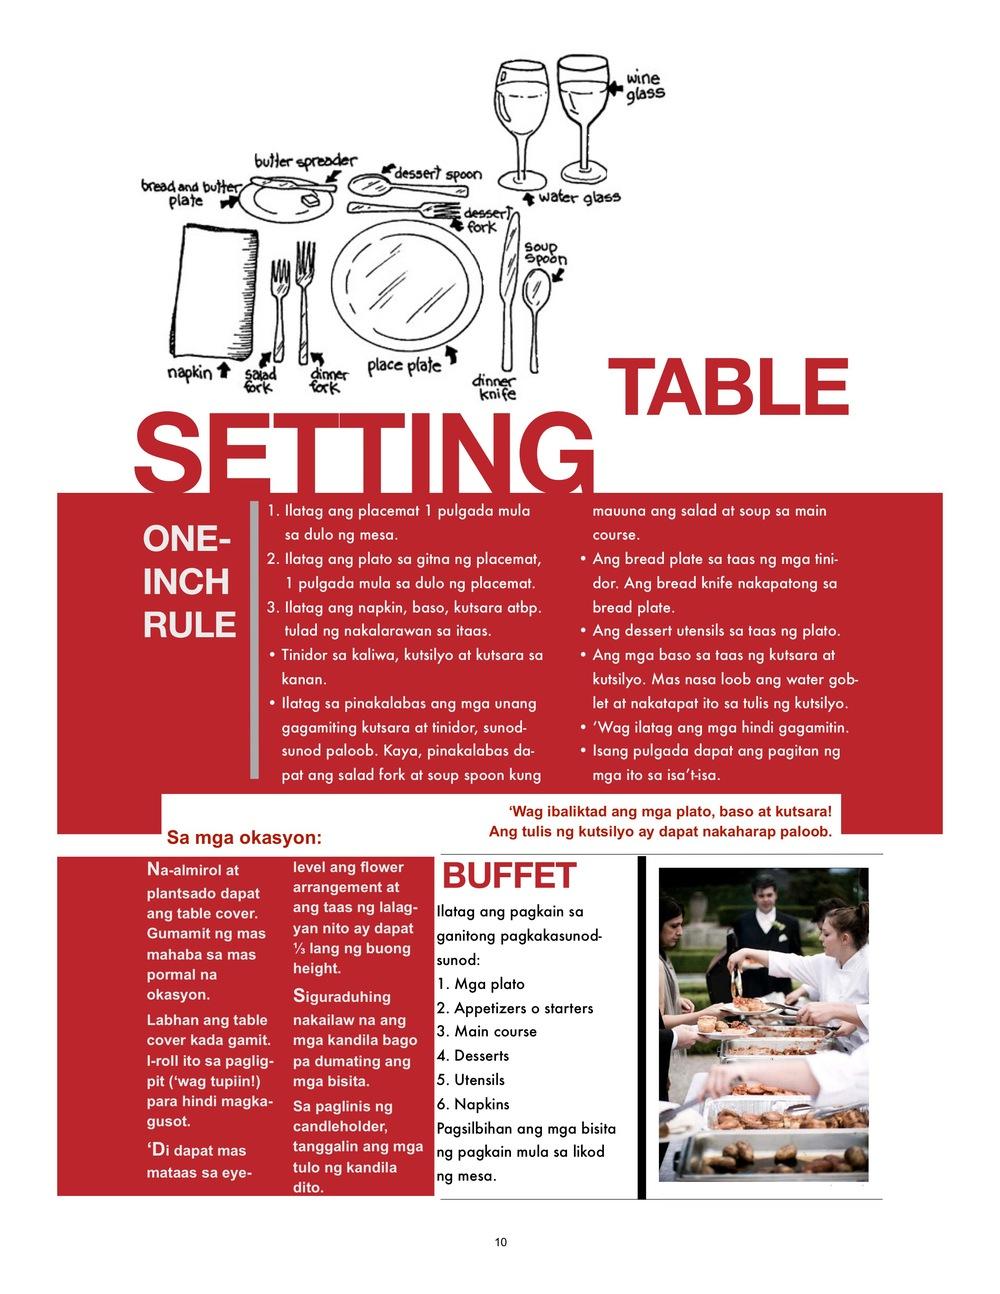 MaidProvider.ph Training Manual NO WATERMARK.pdf 12.jpeg